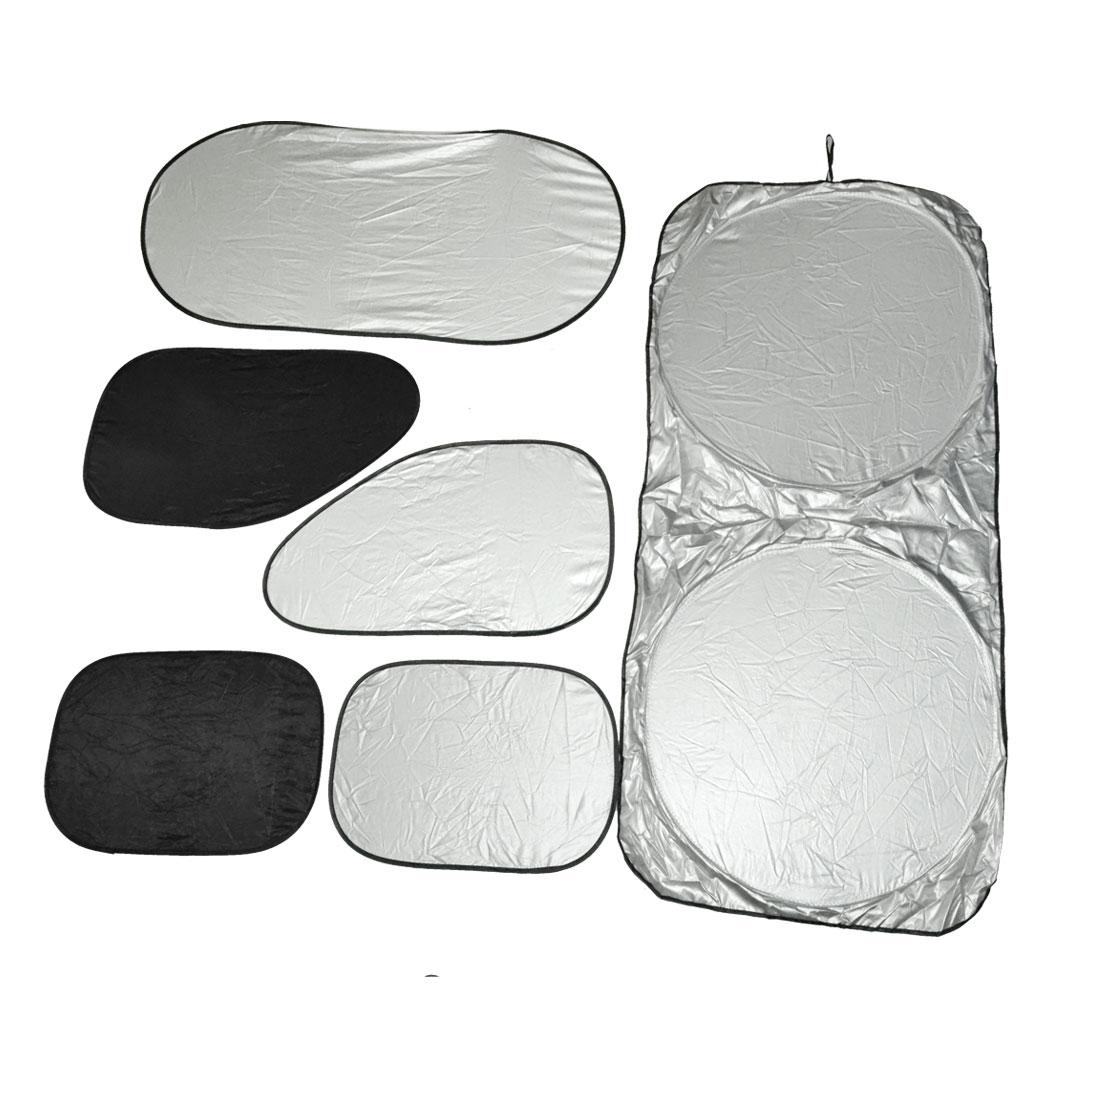 6 in 1 Silver Tone Flexible Car Front Windshield Side Rear Window Sun Shade UV Protection Set